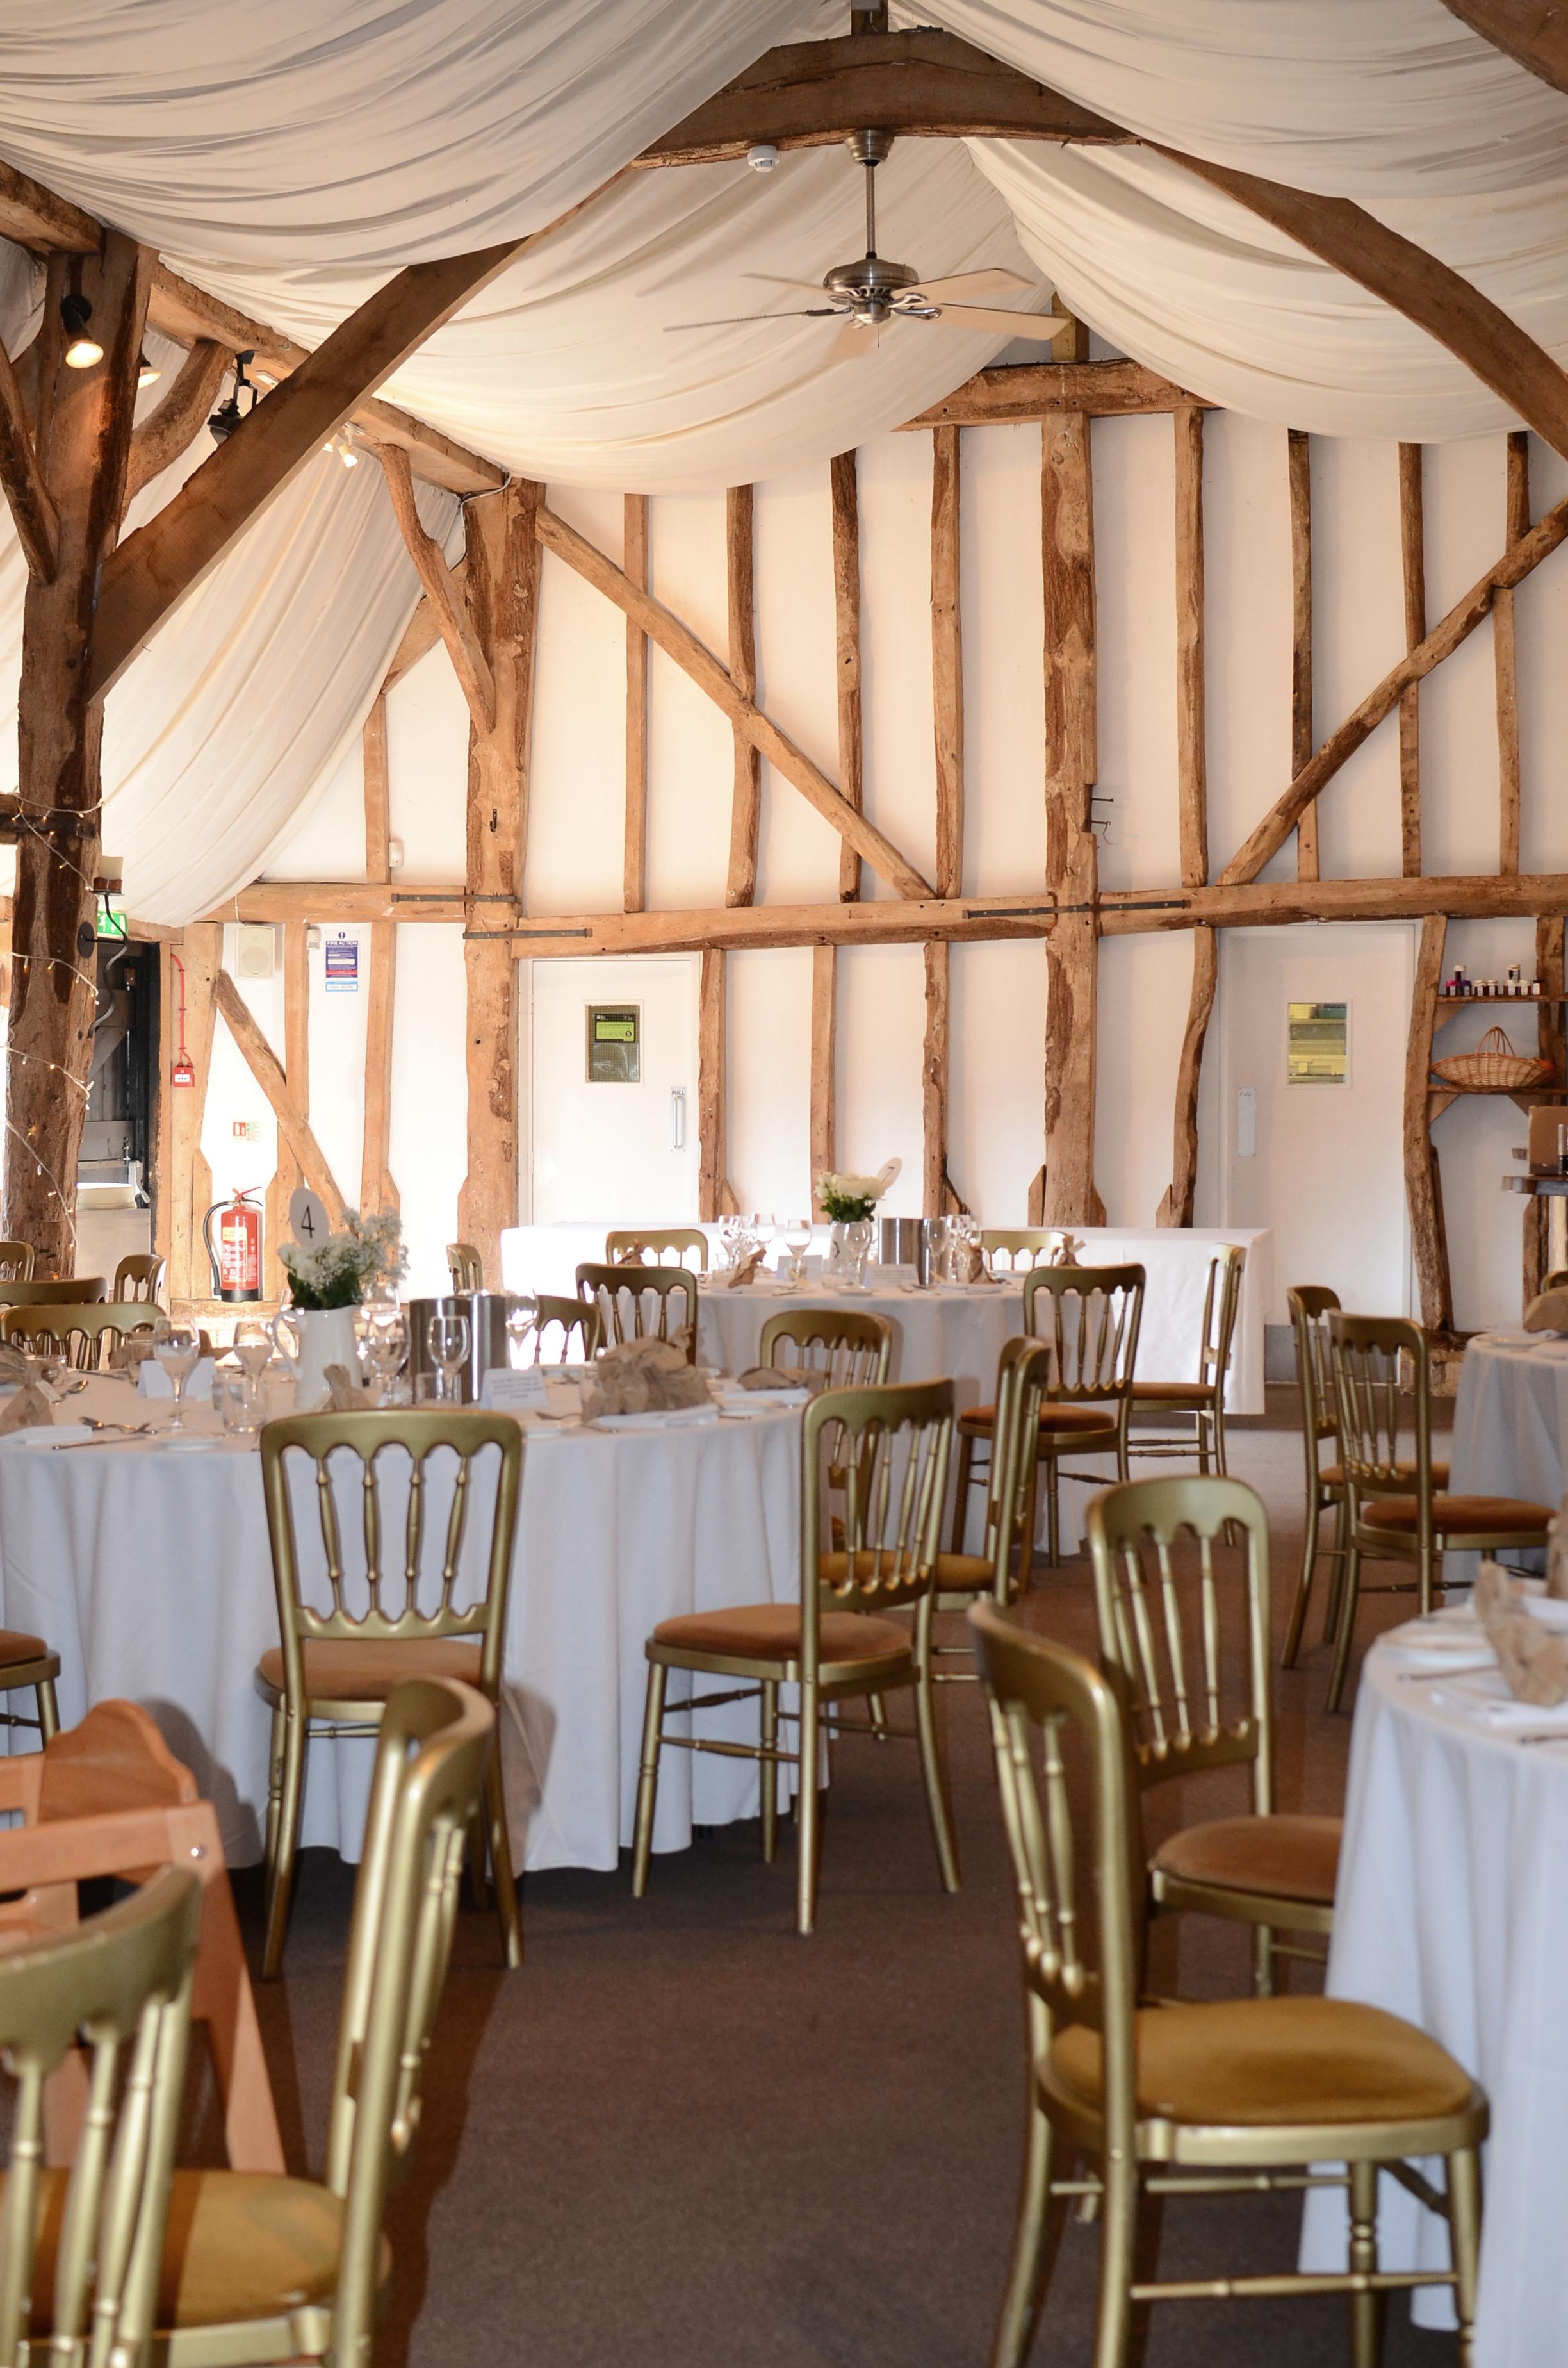 Wedding Breakfast, Barn, Breakfast, Chairs, Meal, HQ Photo